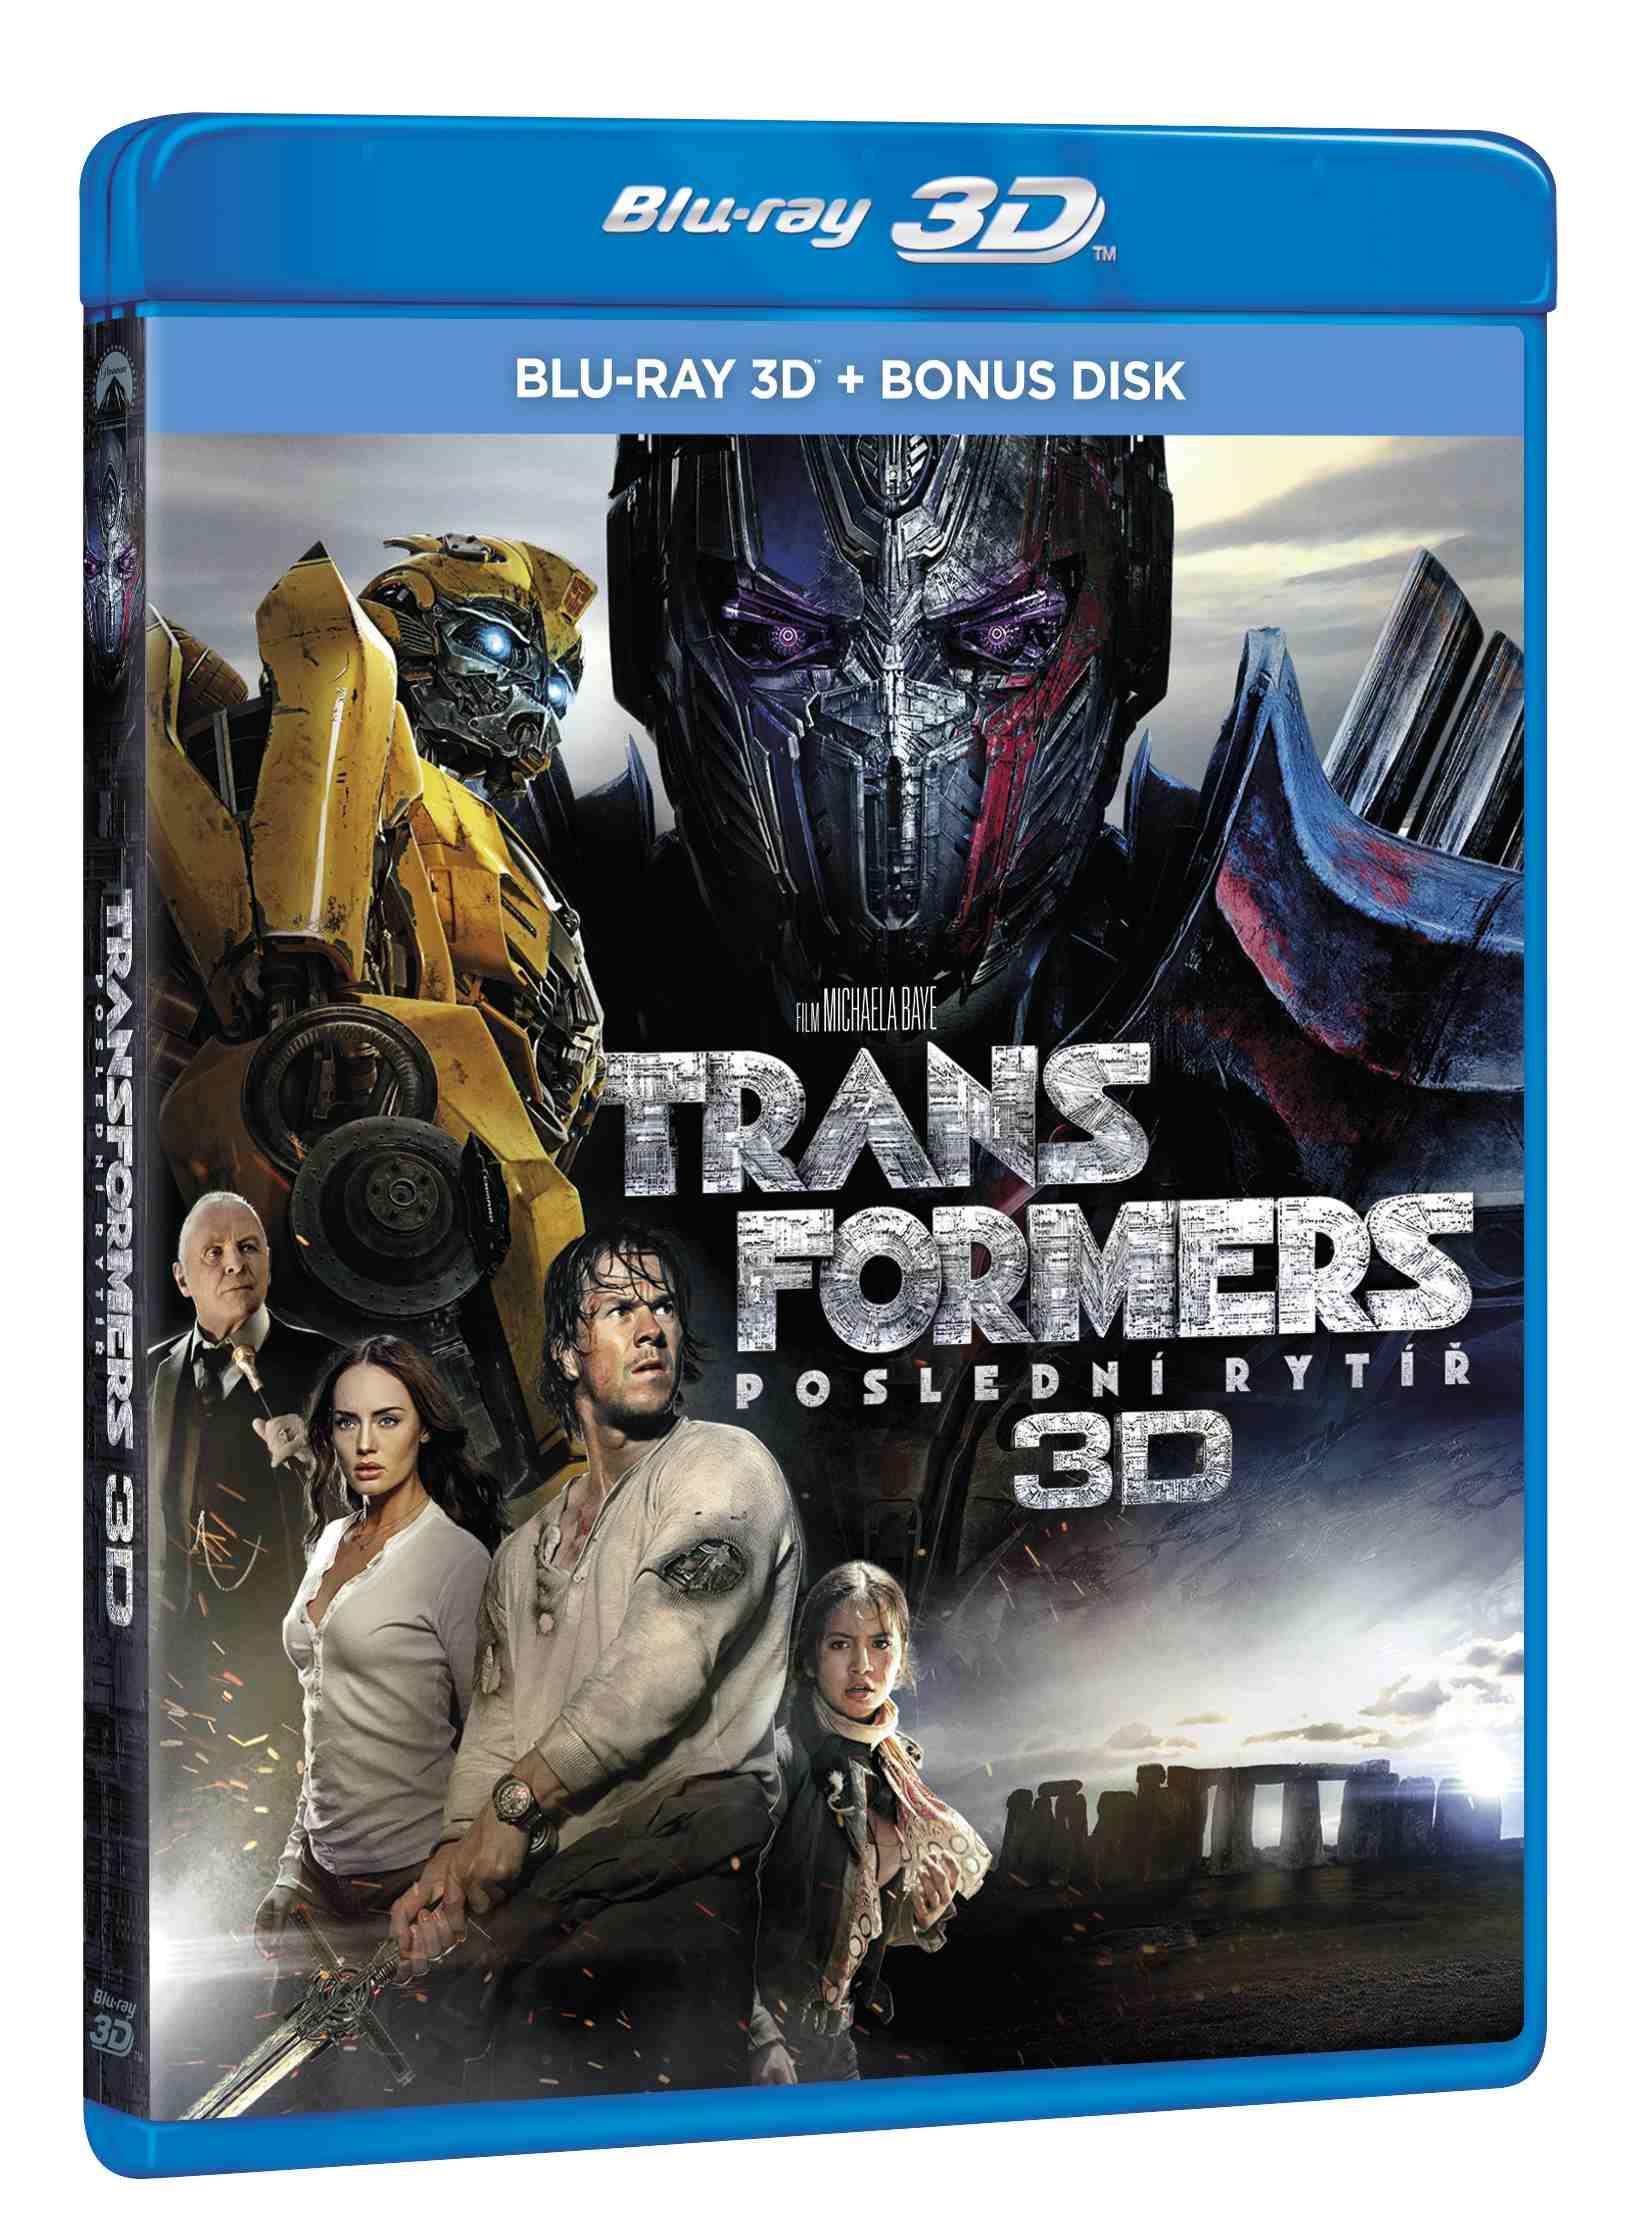 Transformers: Poslední rytíř - Blu-ray 3D + bonusový disk